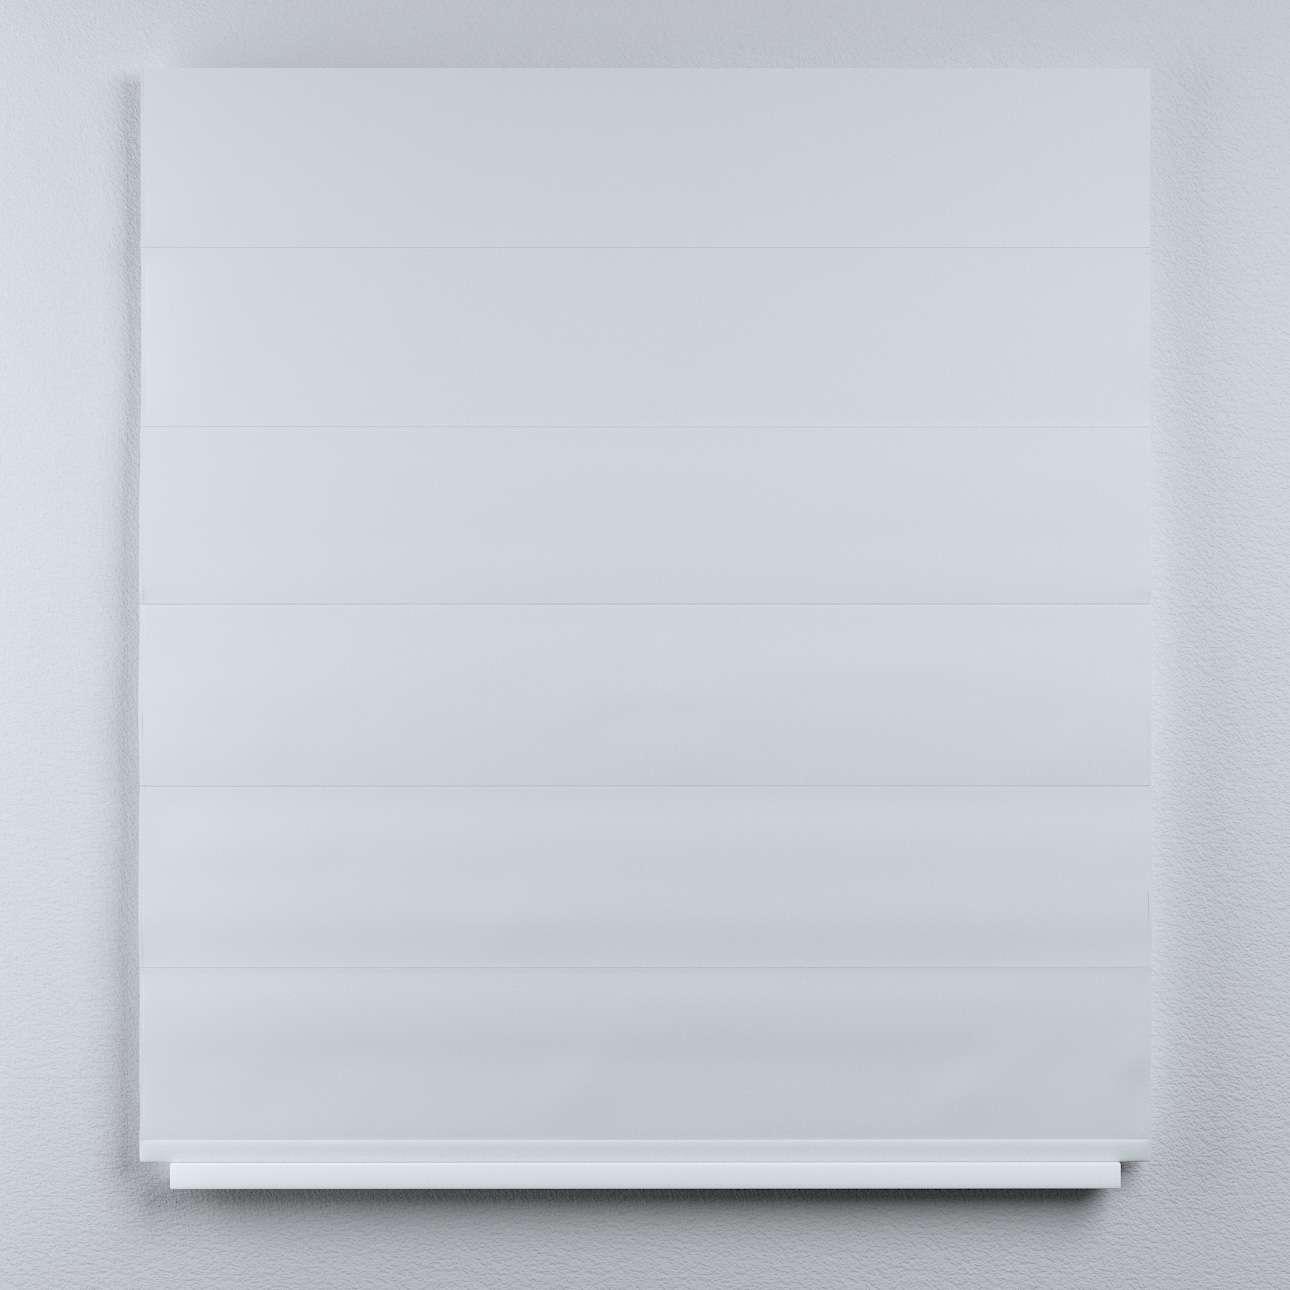 DUO Rímska roleta V kolekcii Blackout 280 cm, tkanina: 269-05